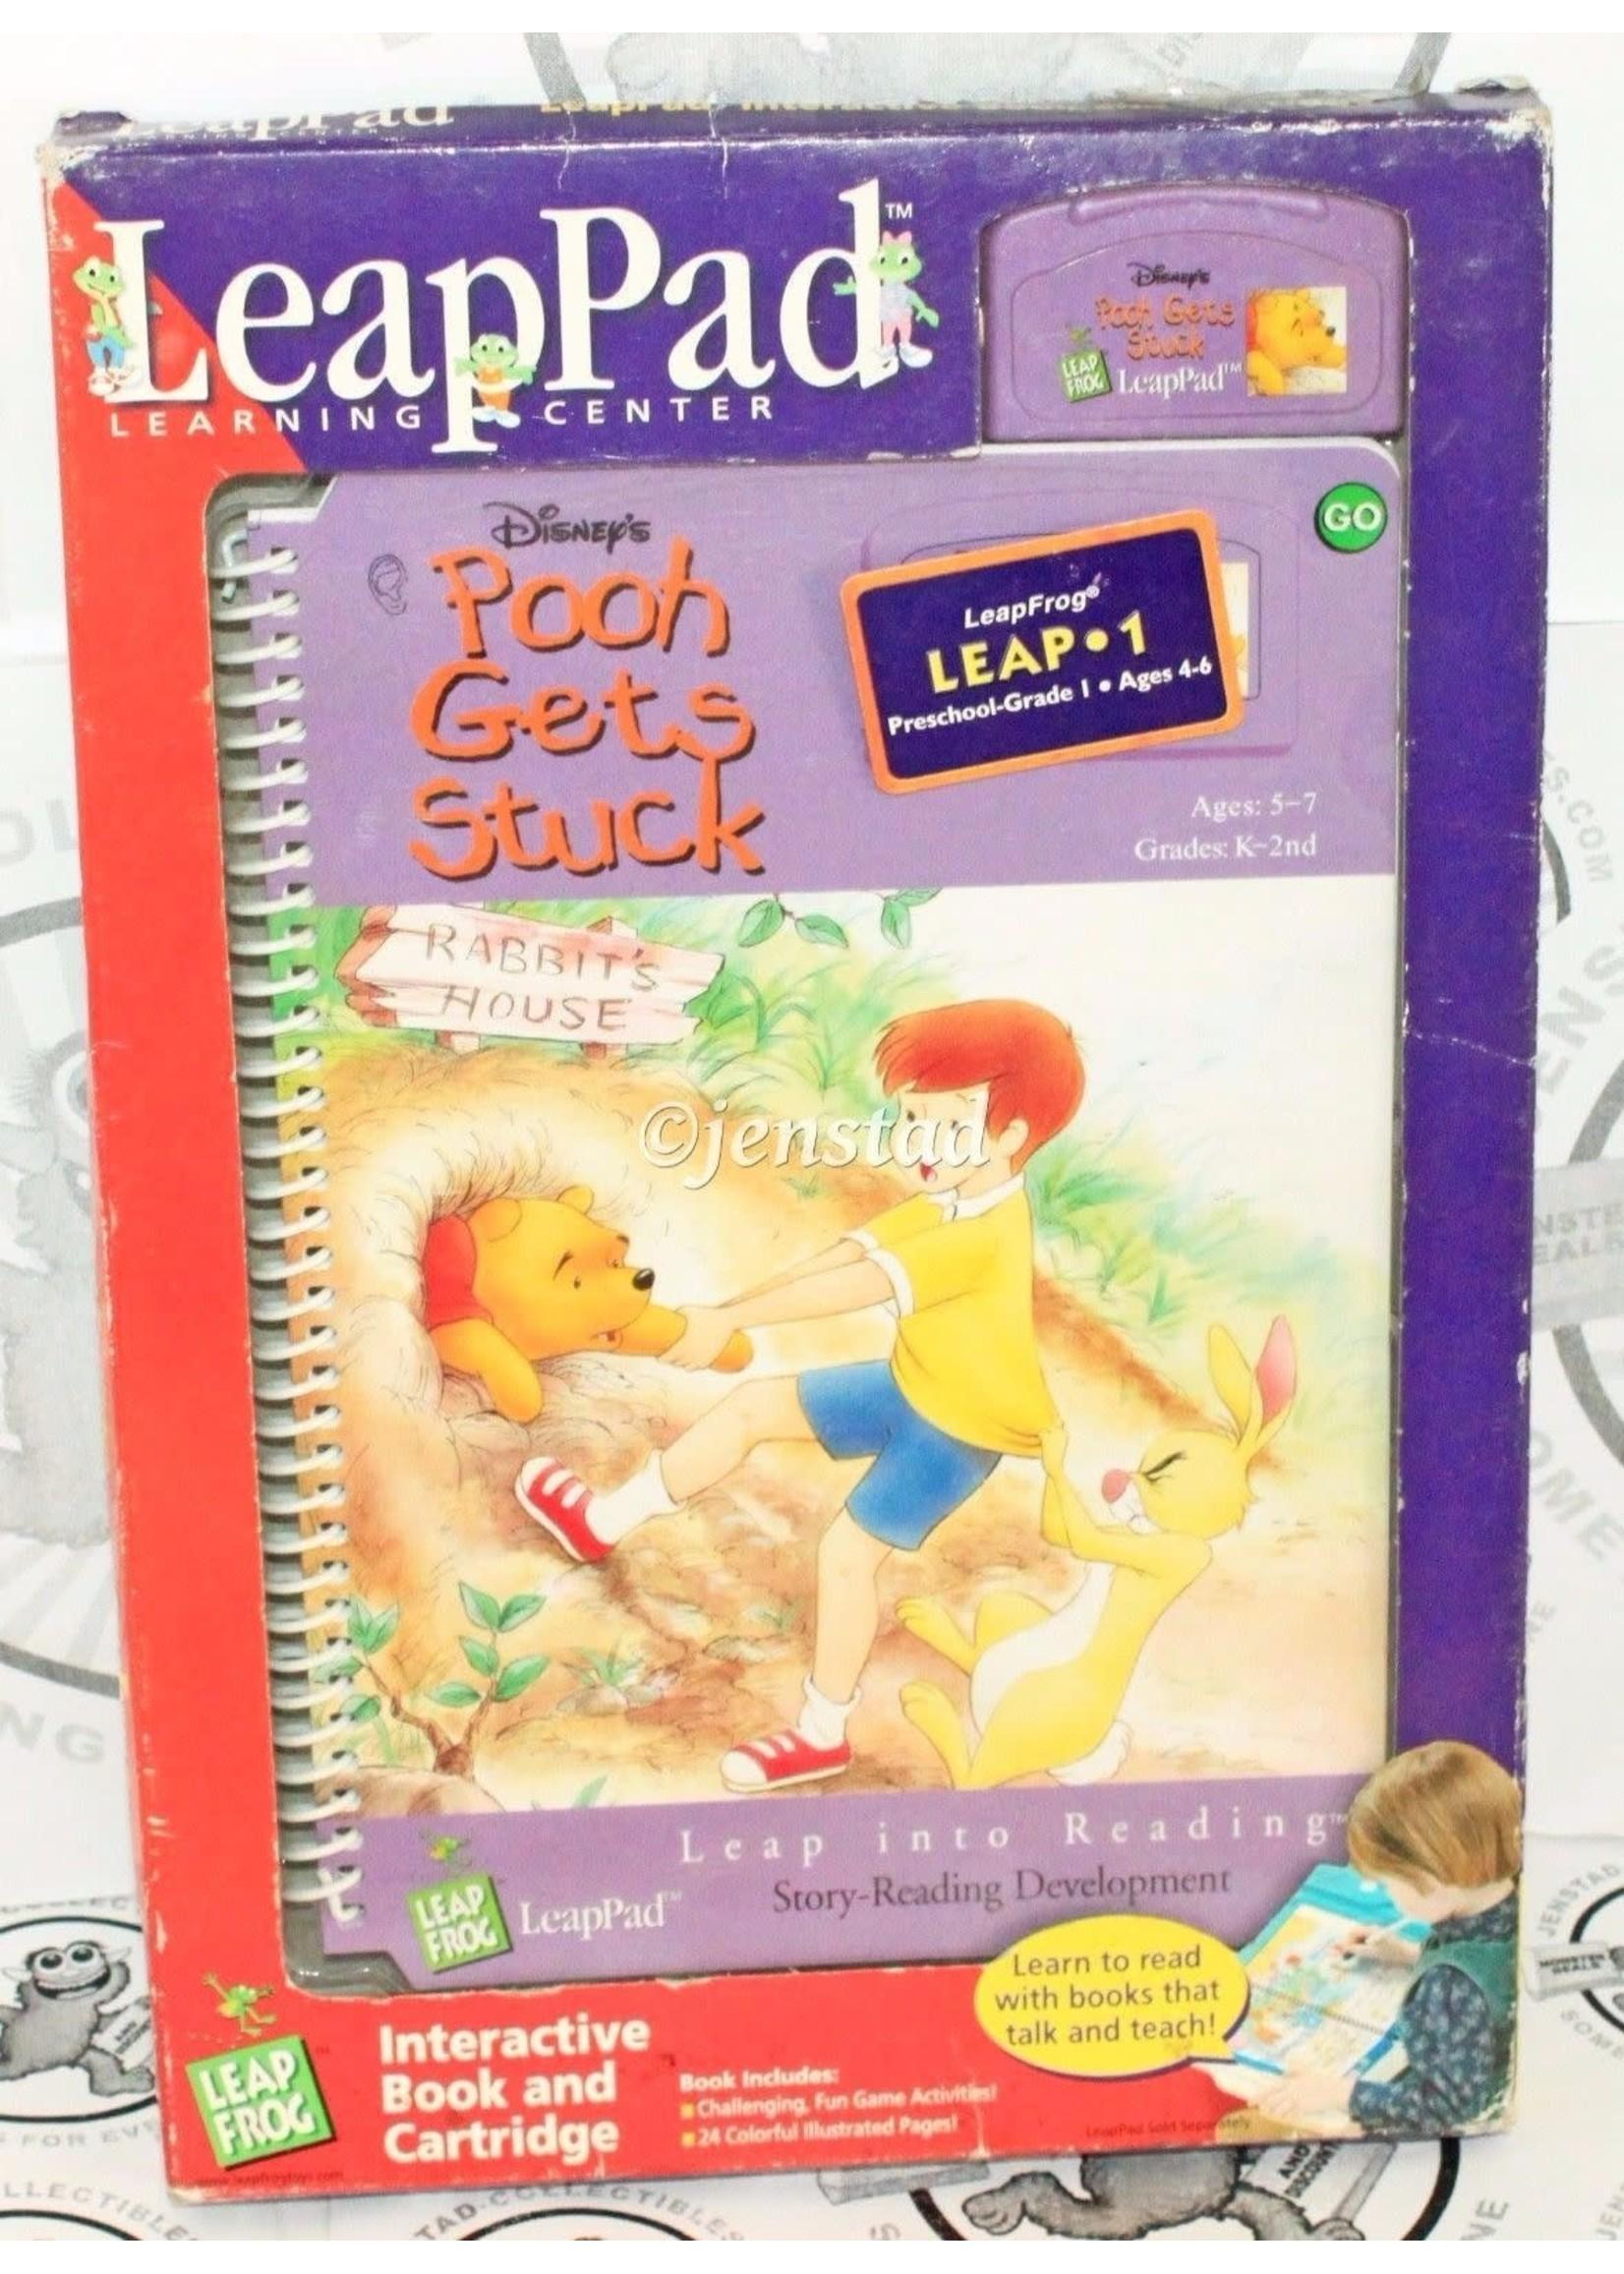 Disney's Pooh Gets Stuck LeapPad